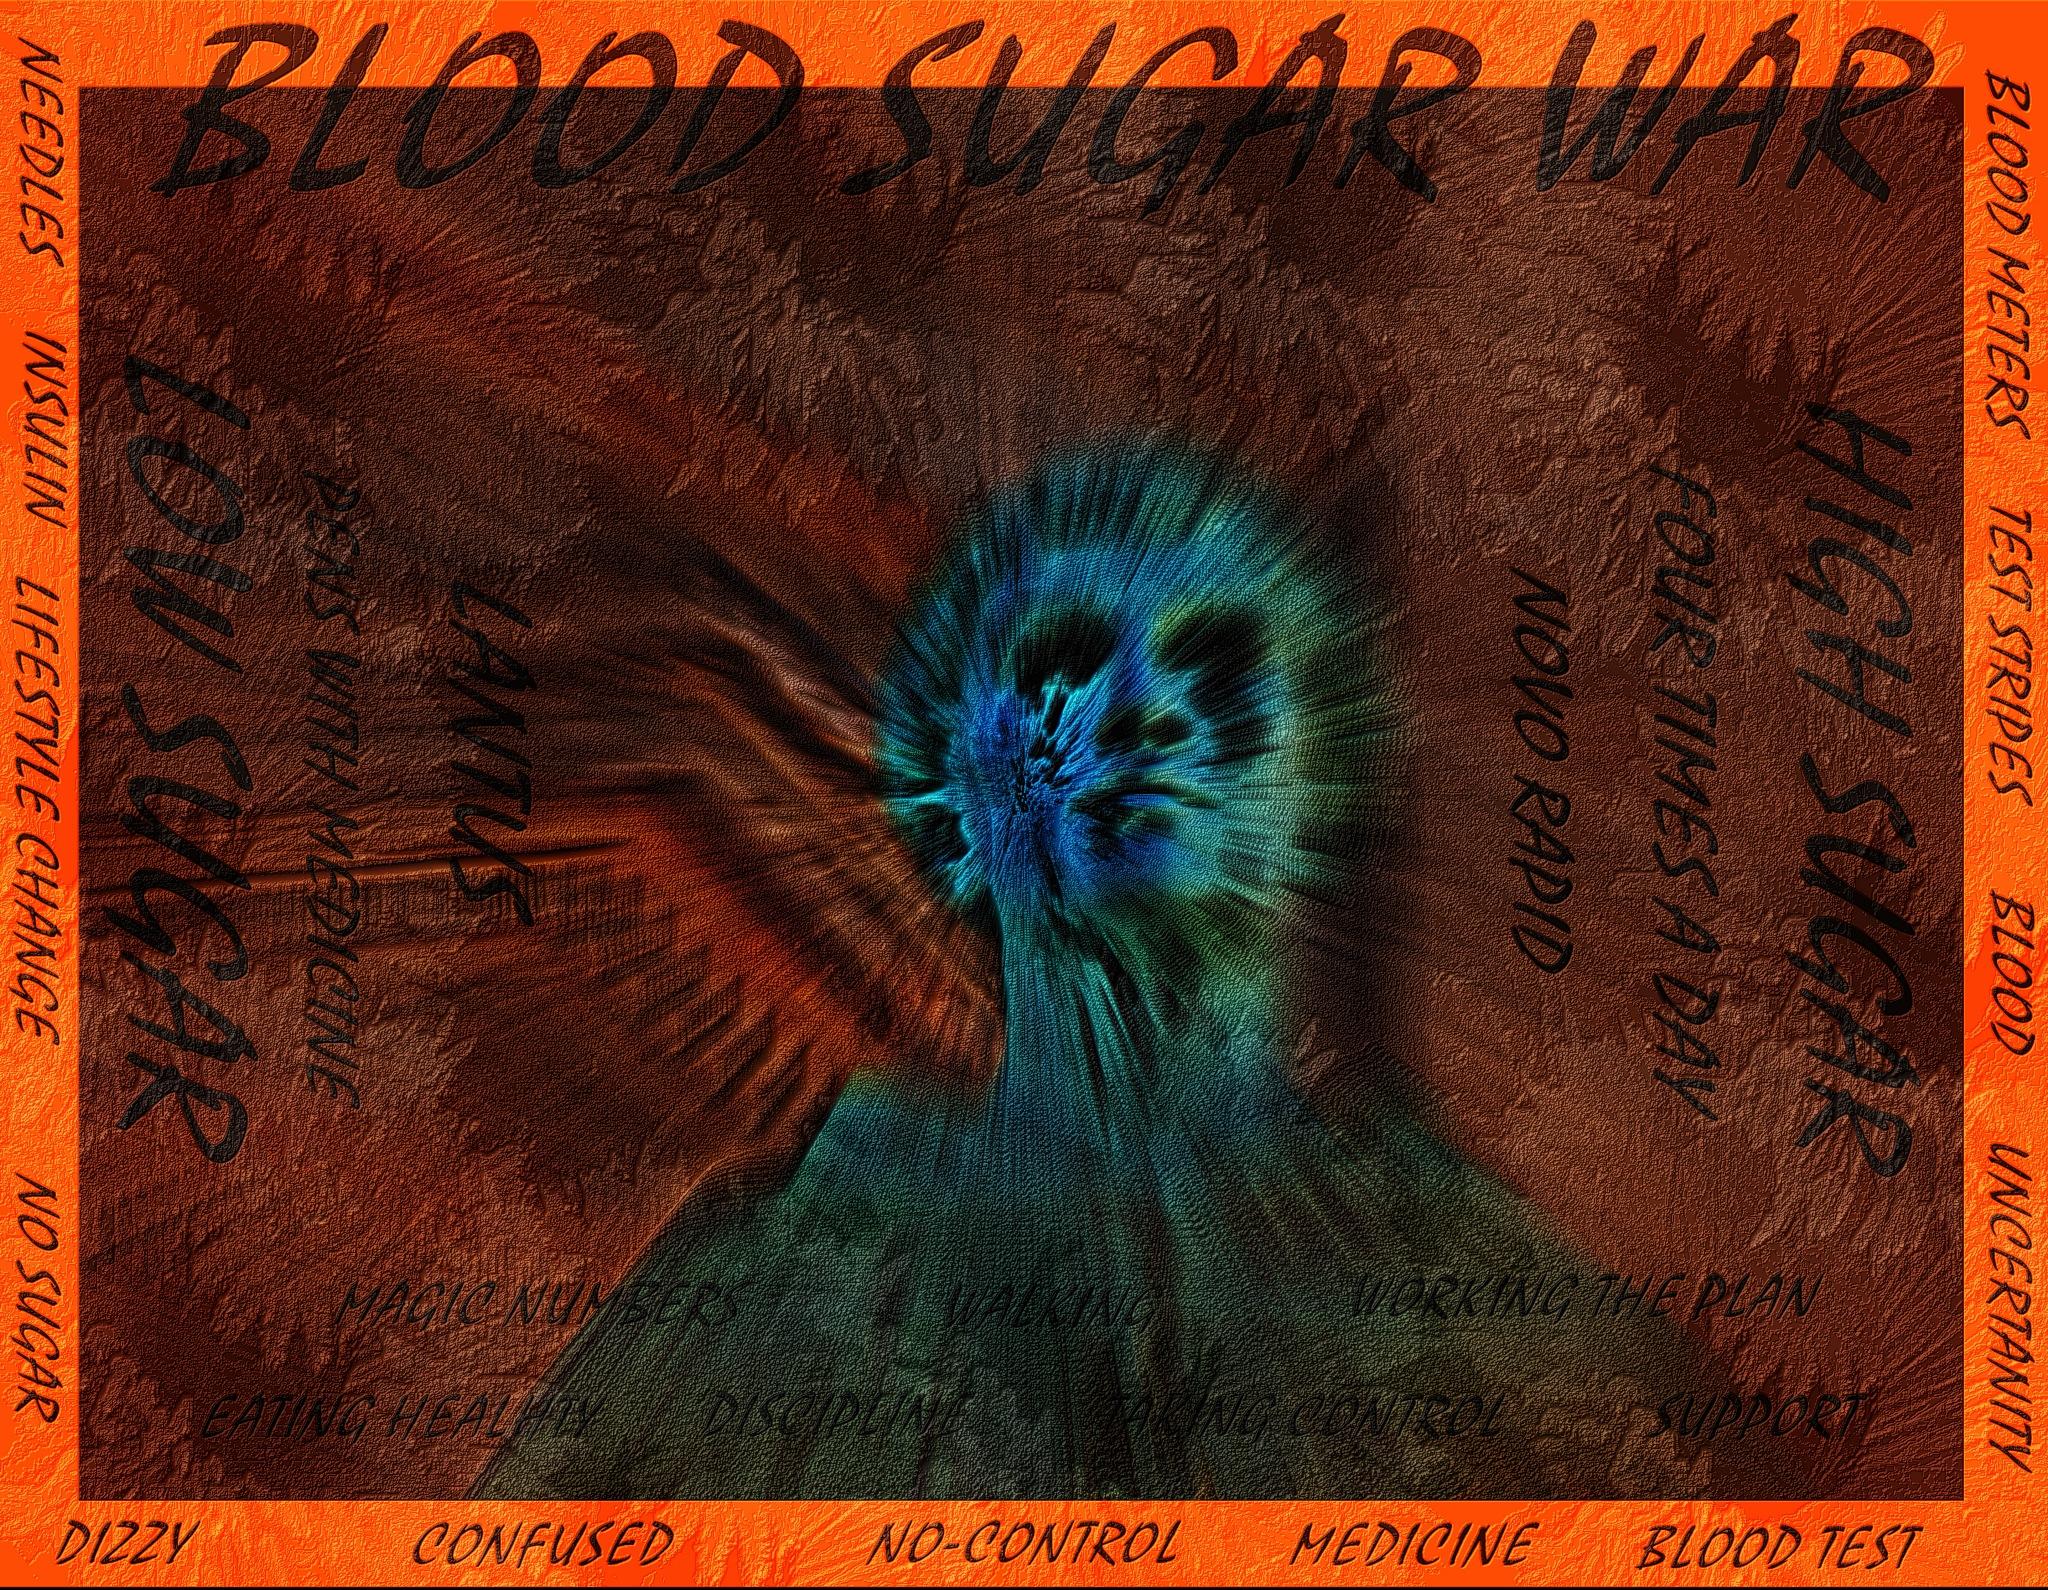 blood sugar by Terry Dunn